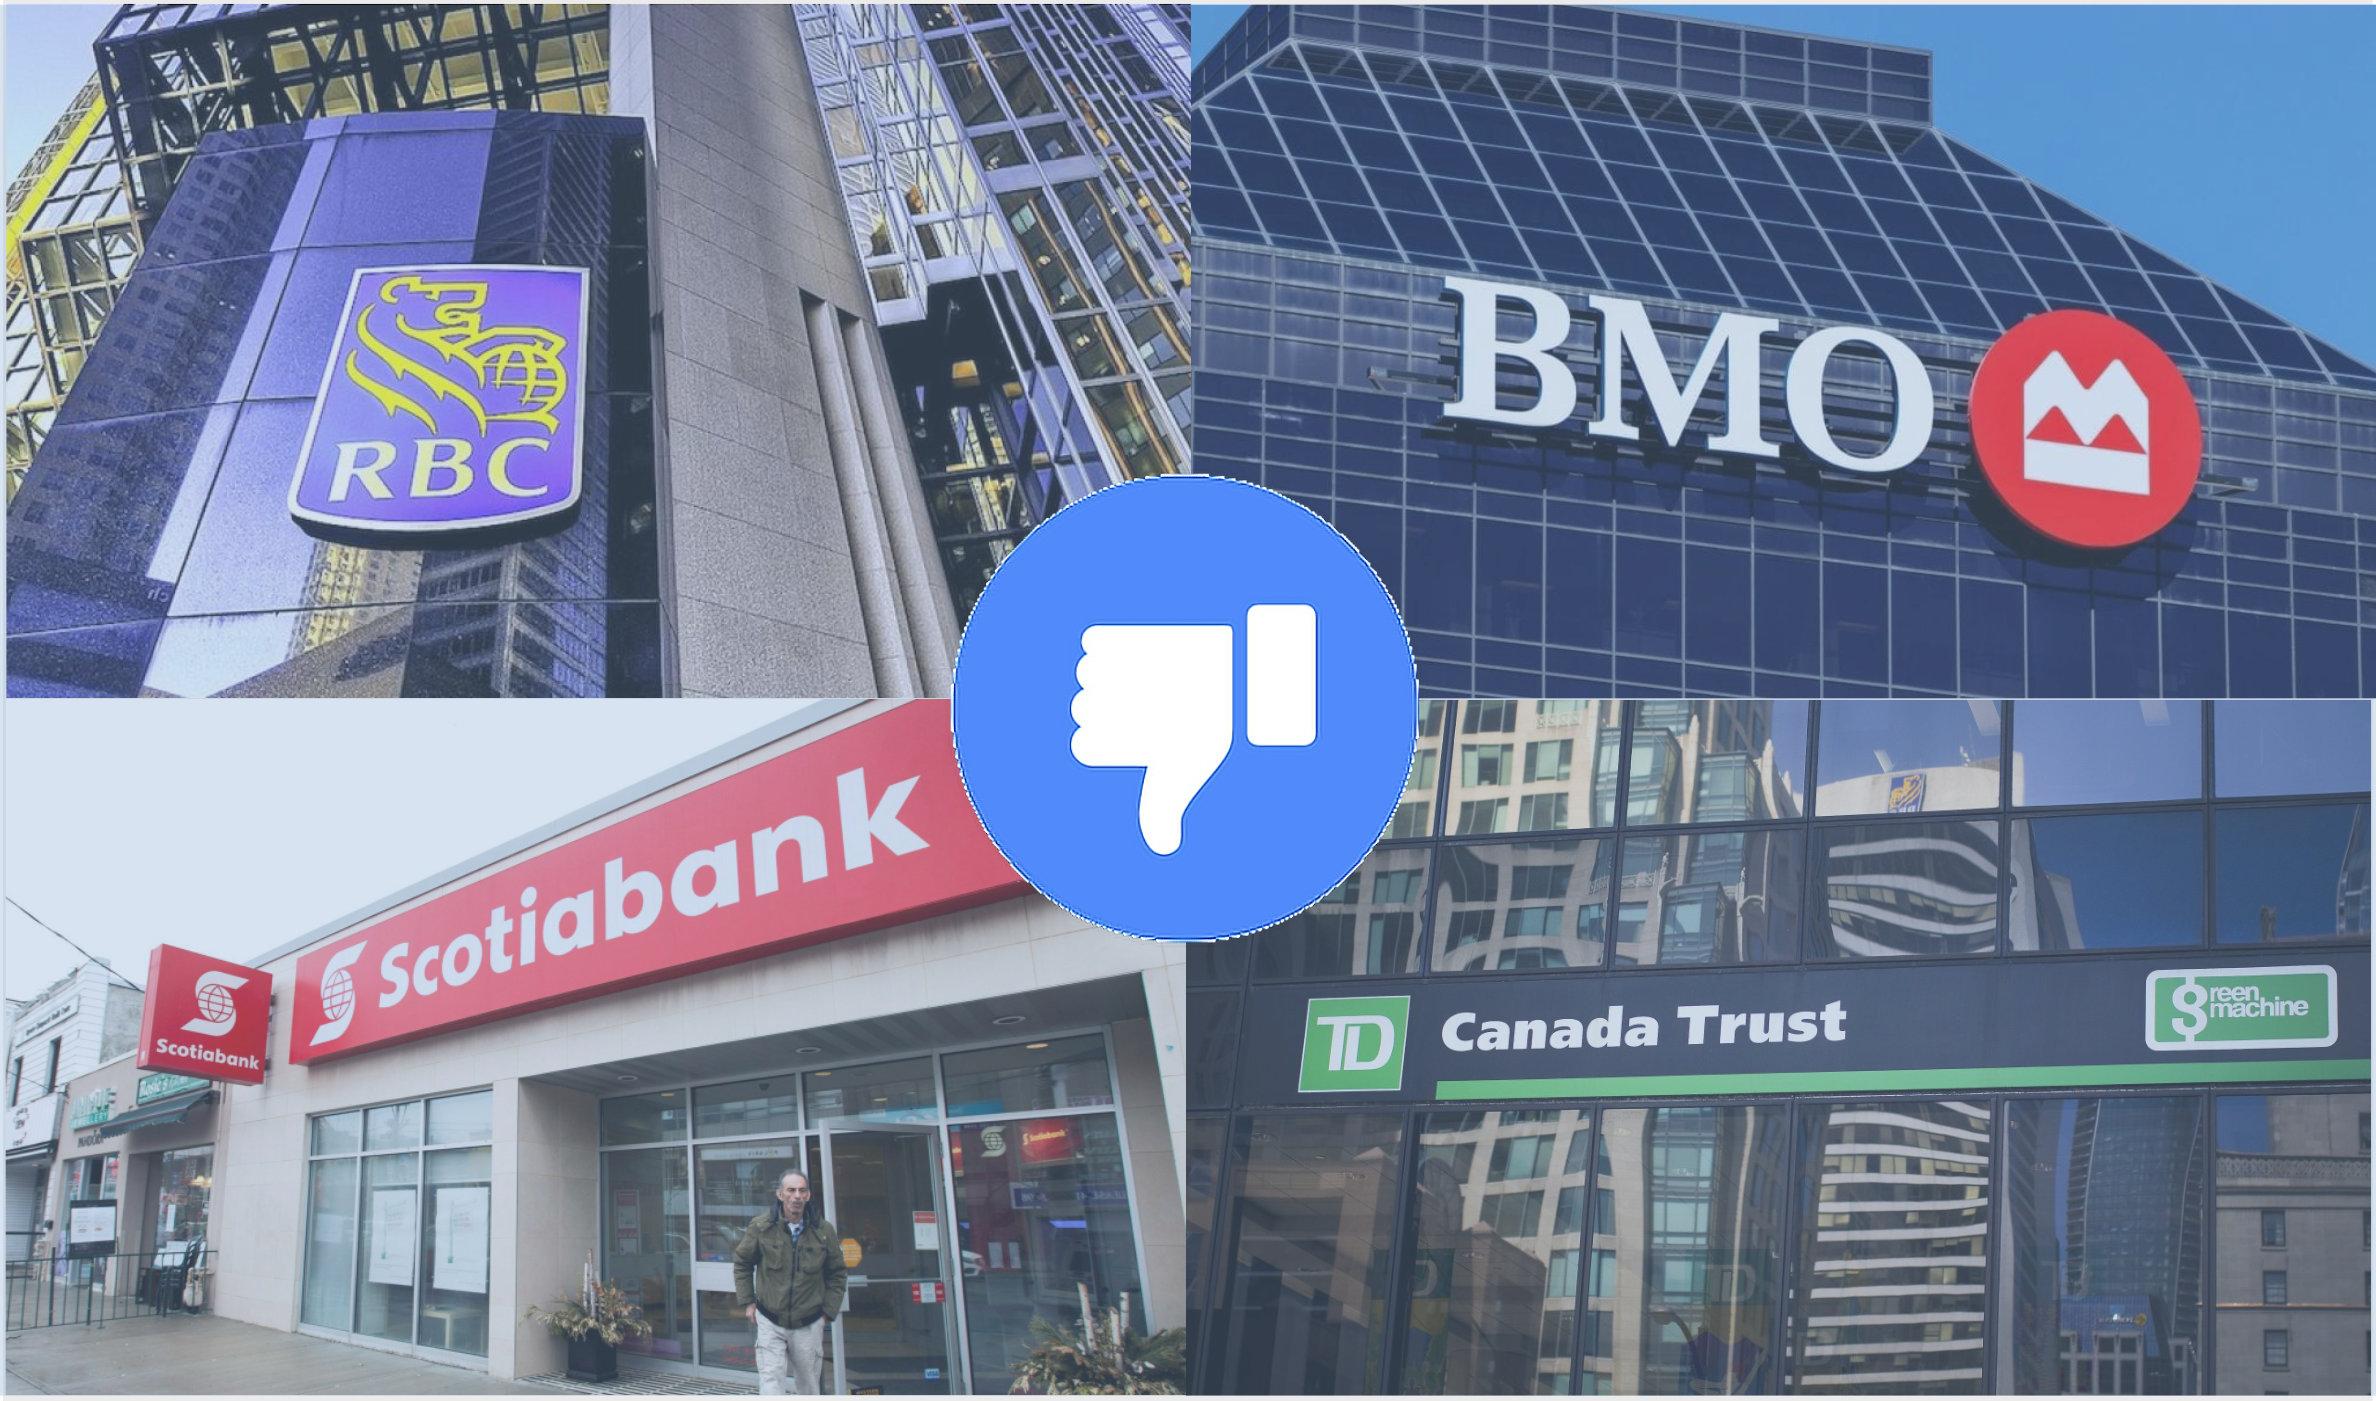 Bancos canadienses se unen a boicot contra Facebook